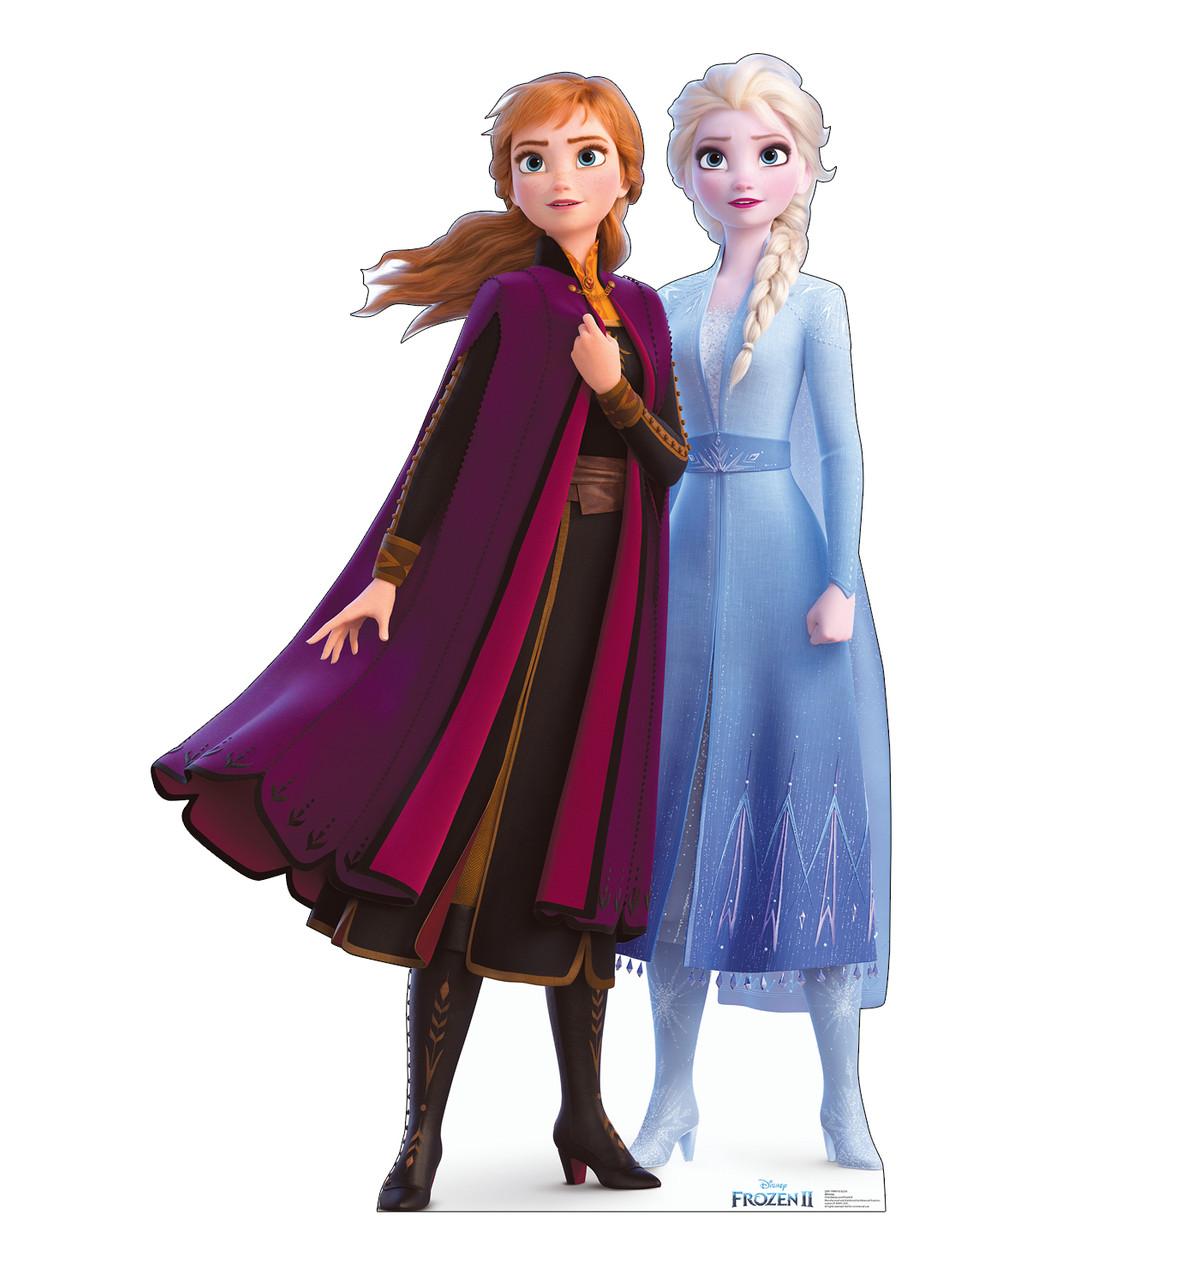 Cardboard Standee Of Anna Elsa Frozen 2 Disney Frozen Anna Elsa